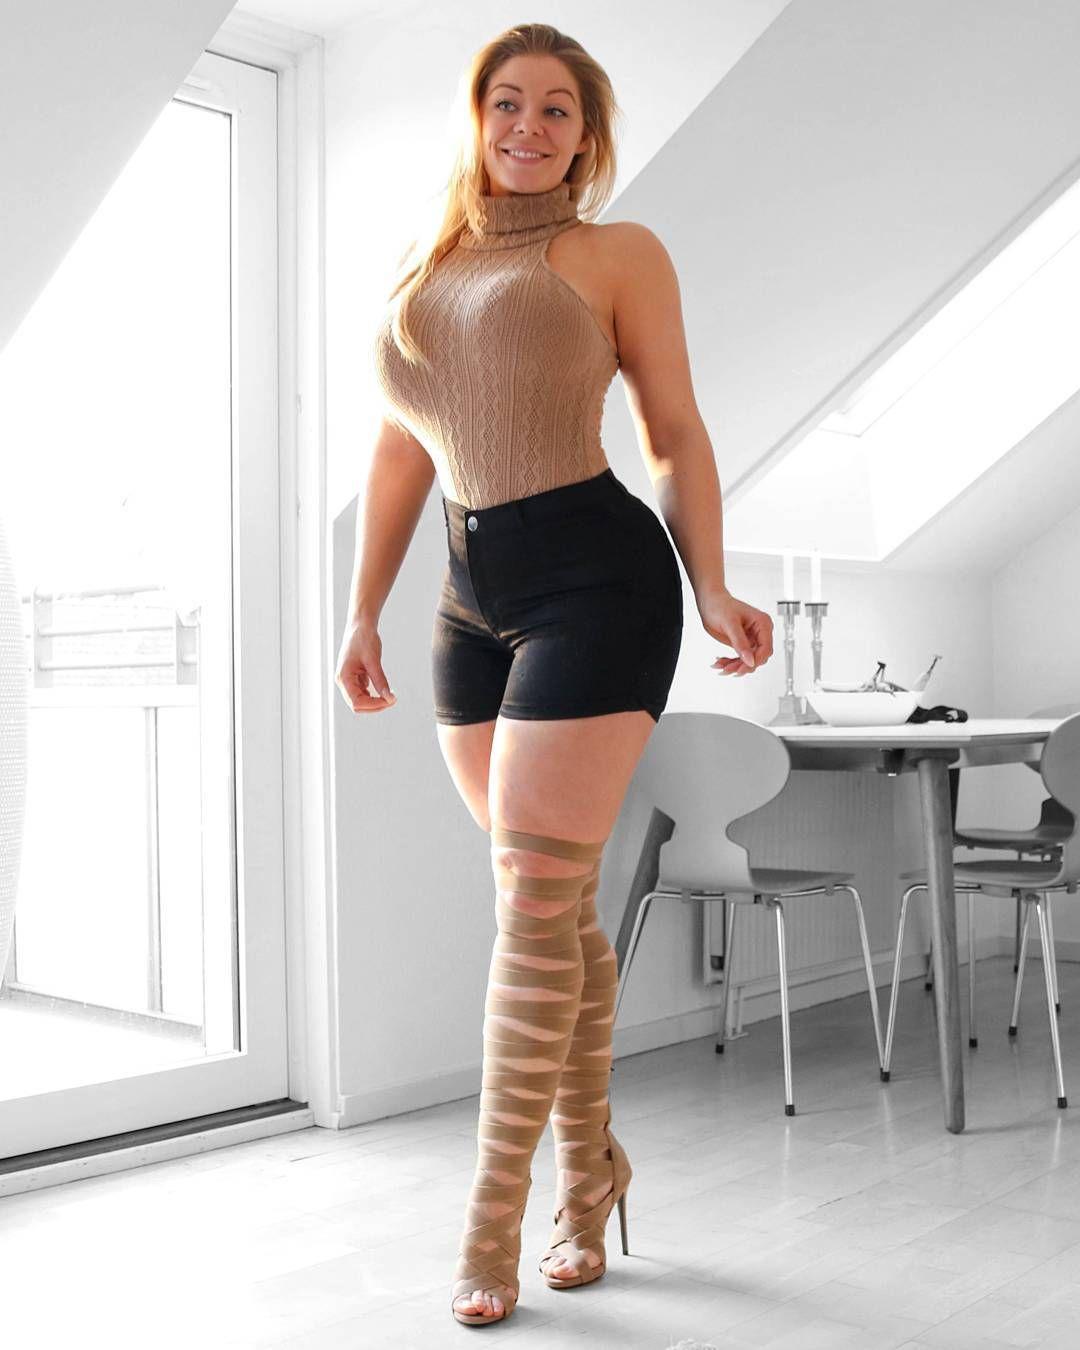 Video Mia Sand nude photos 2019